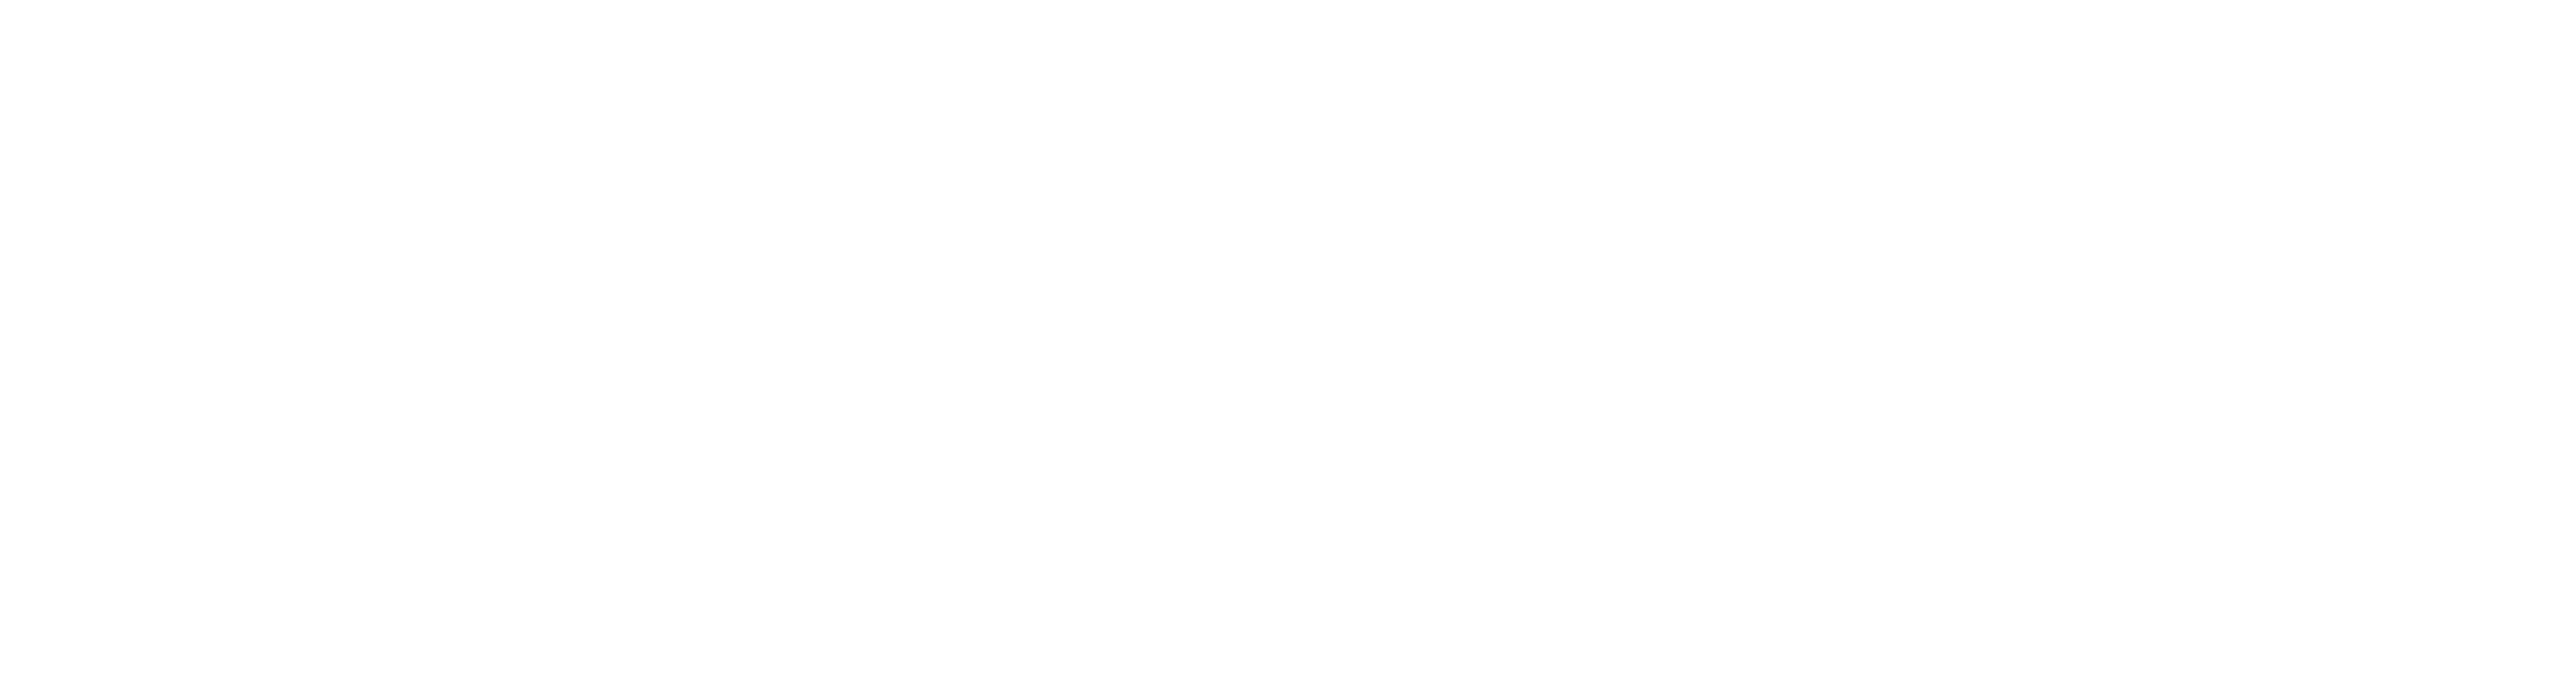 Michael Hinterleitner